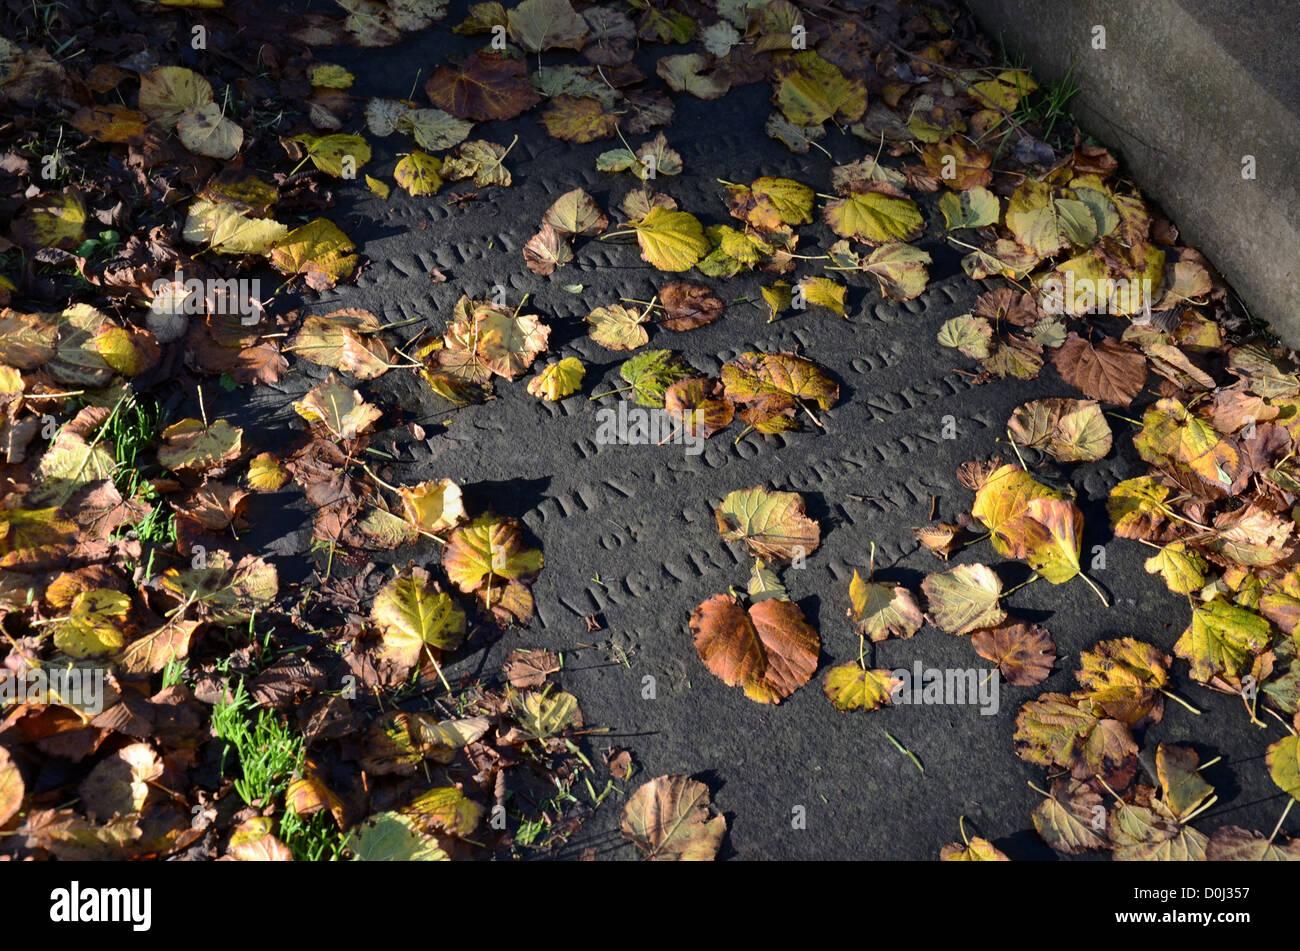 Autumn leaves on a gravestone in Greyfriars Kirkyard, Edinburgh, Scotland. - Stock Image